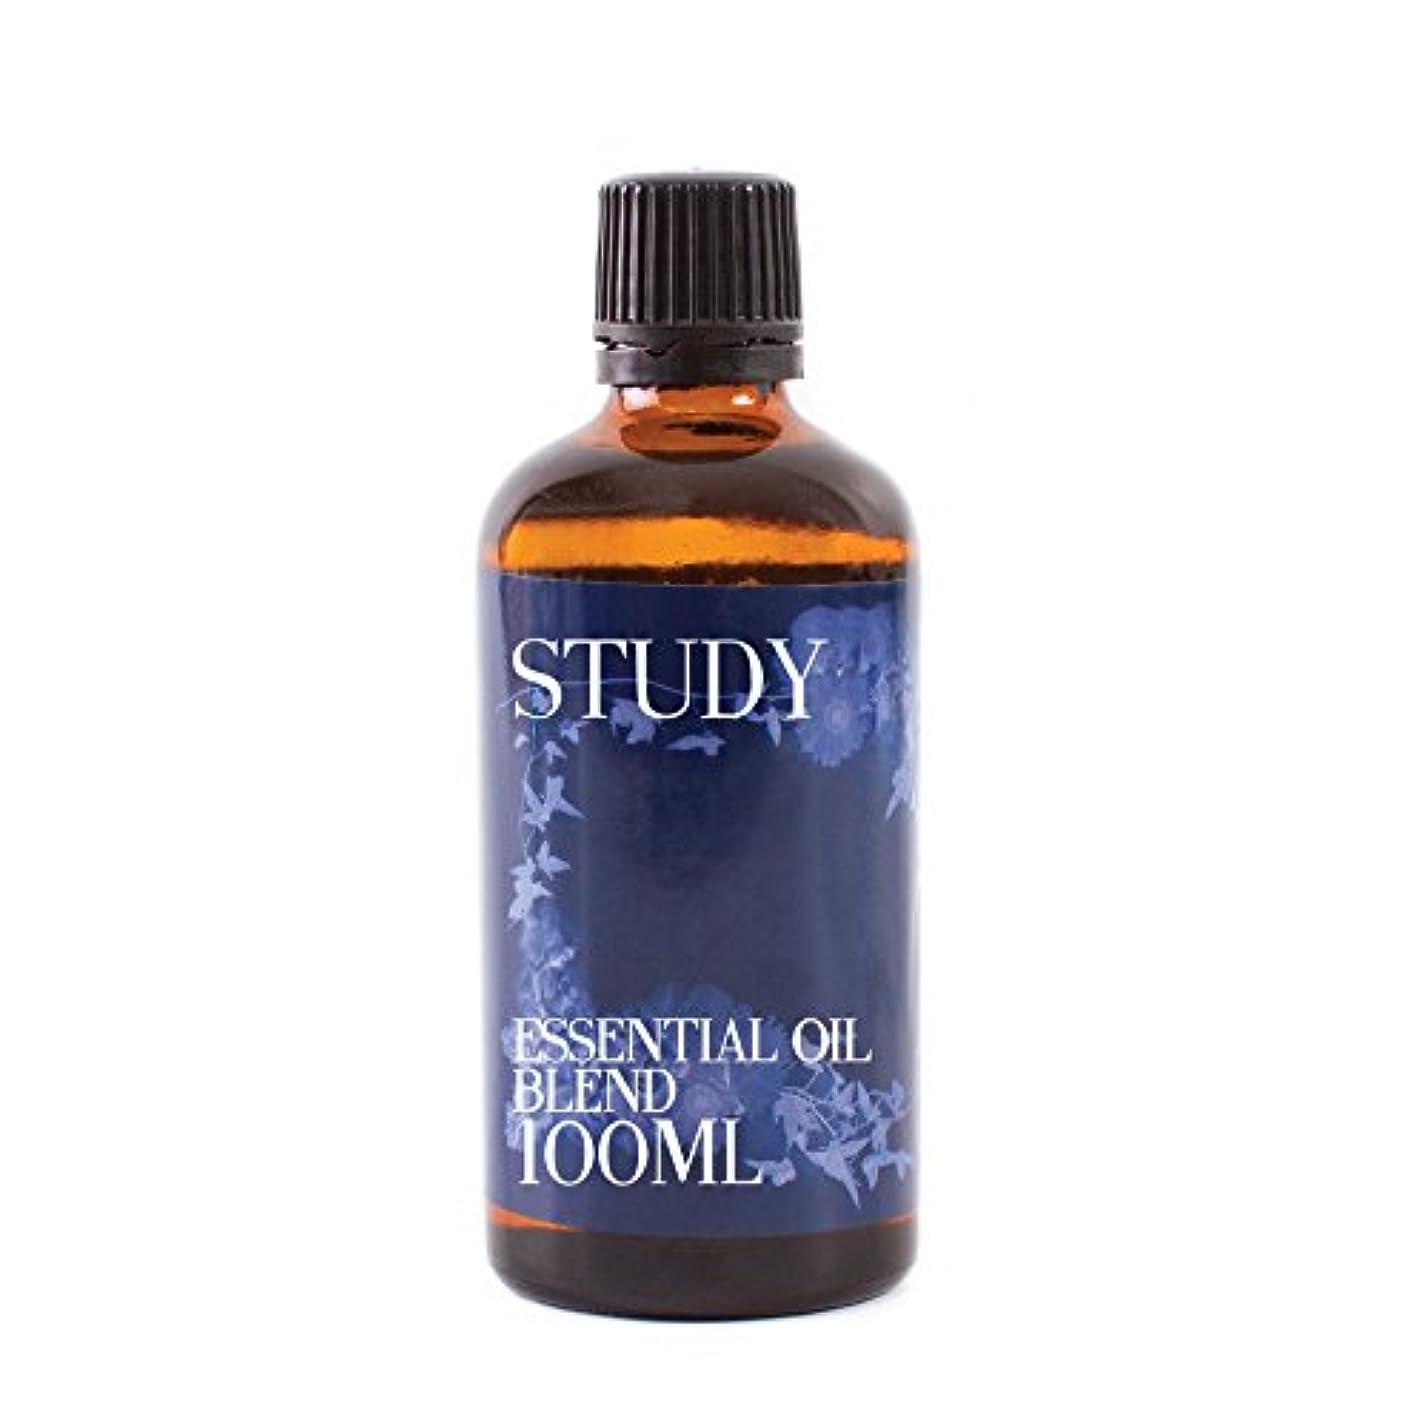 Mystic Moments | Study Essential Oil Blend - 100ml - 100% Pure